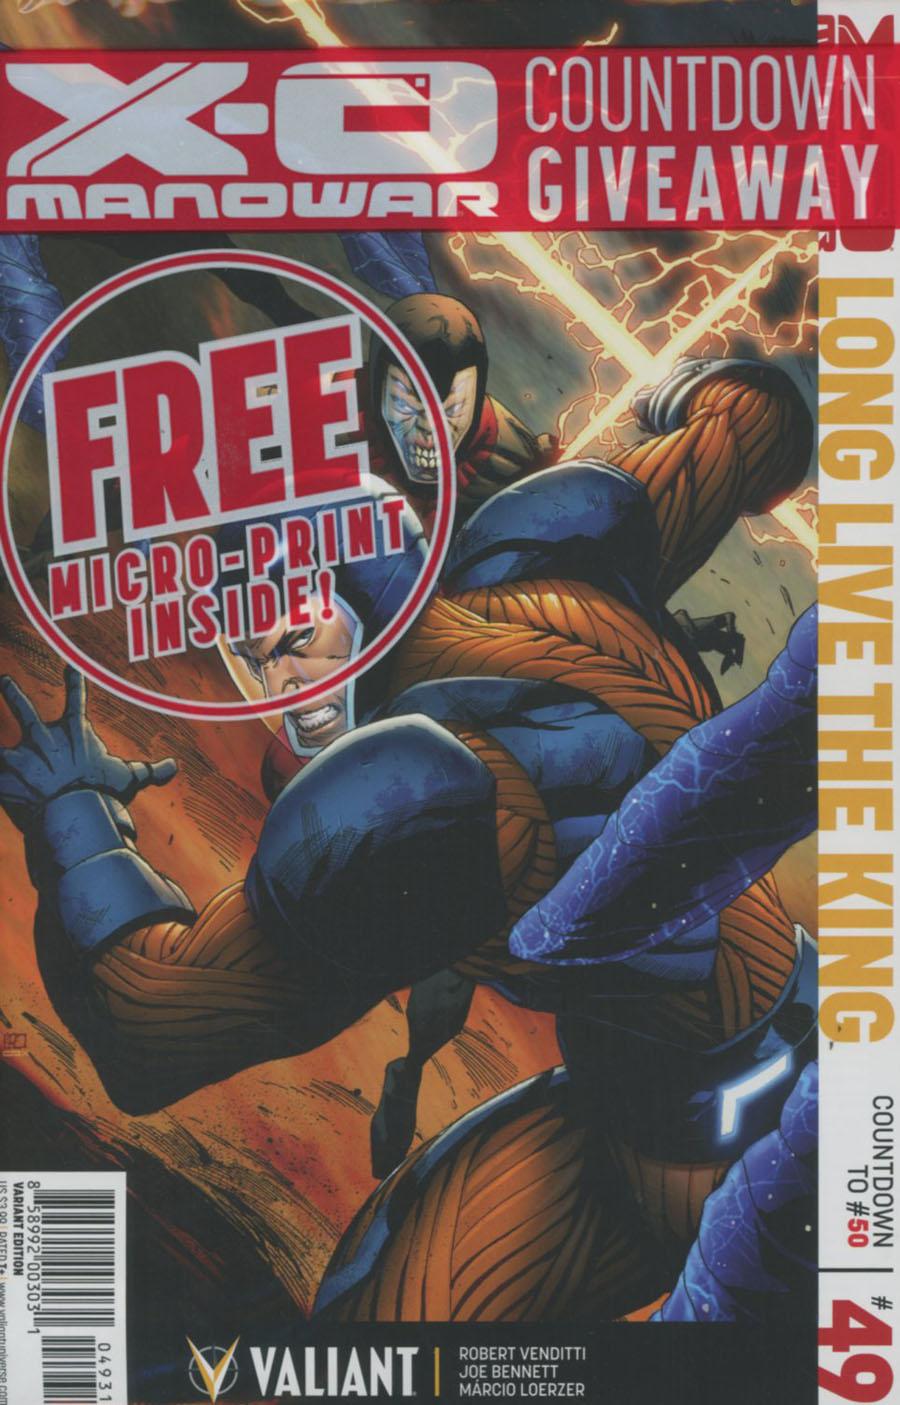 X-O Manowar Vol 3 #49 Cover C Variant Khoi Pham Cover